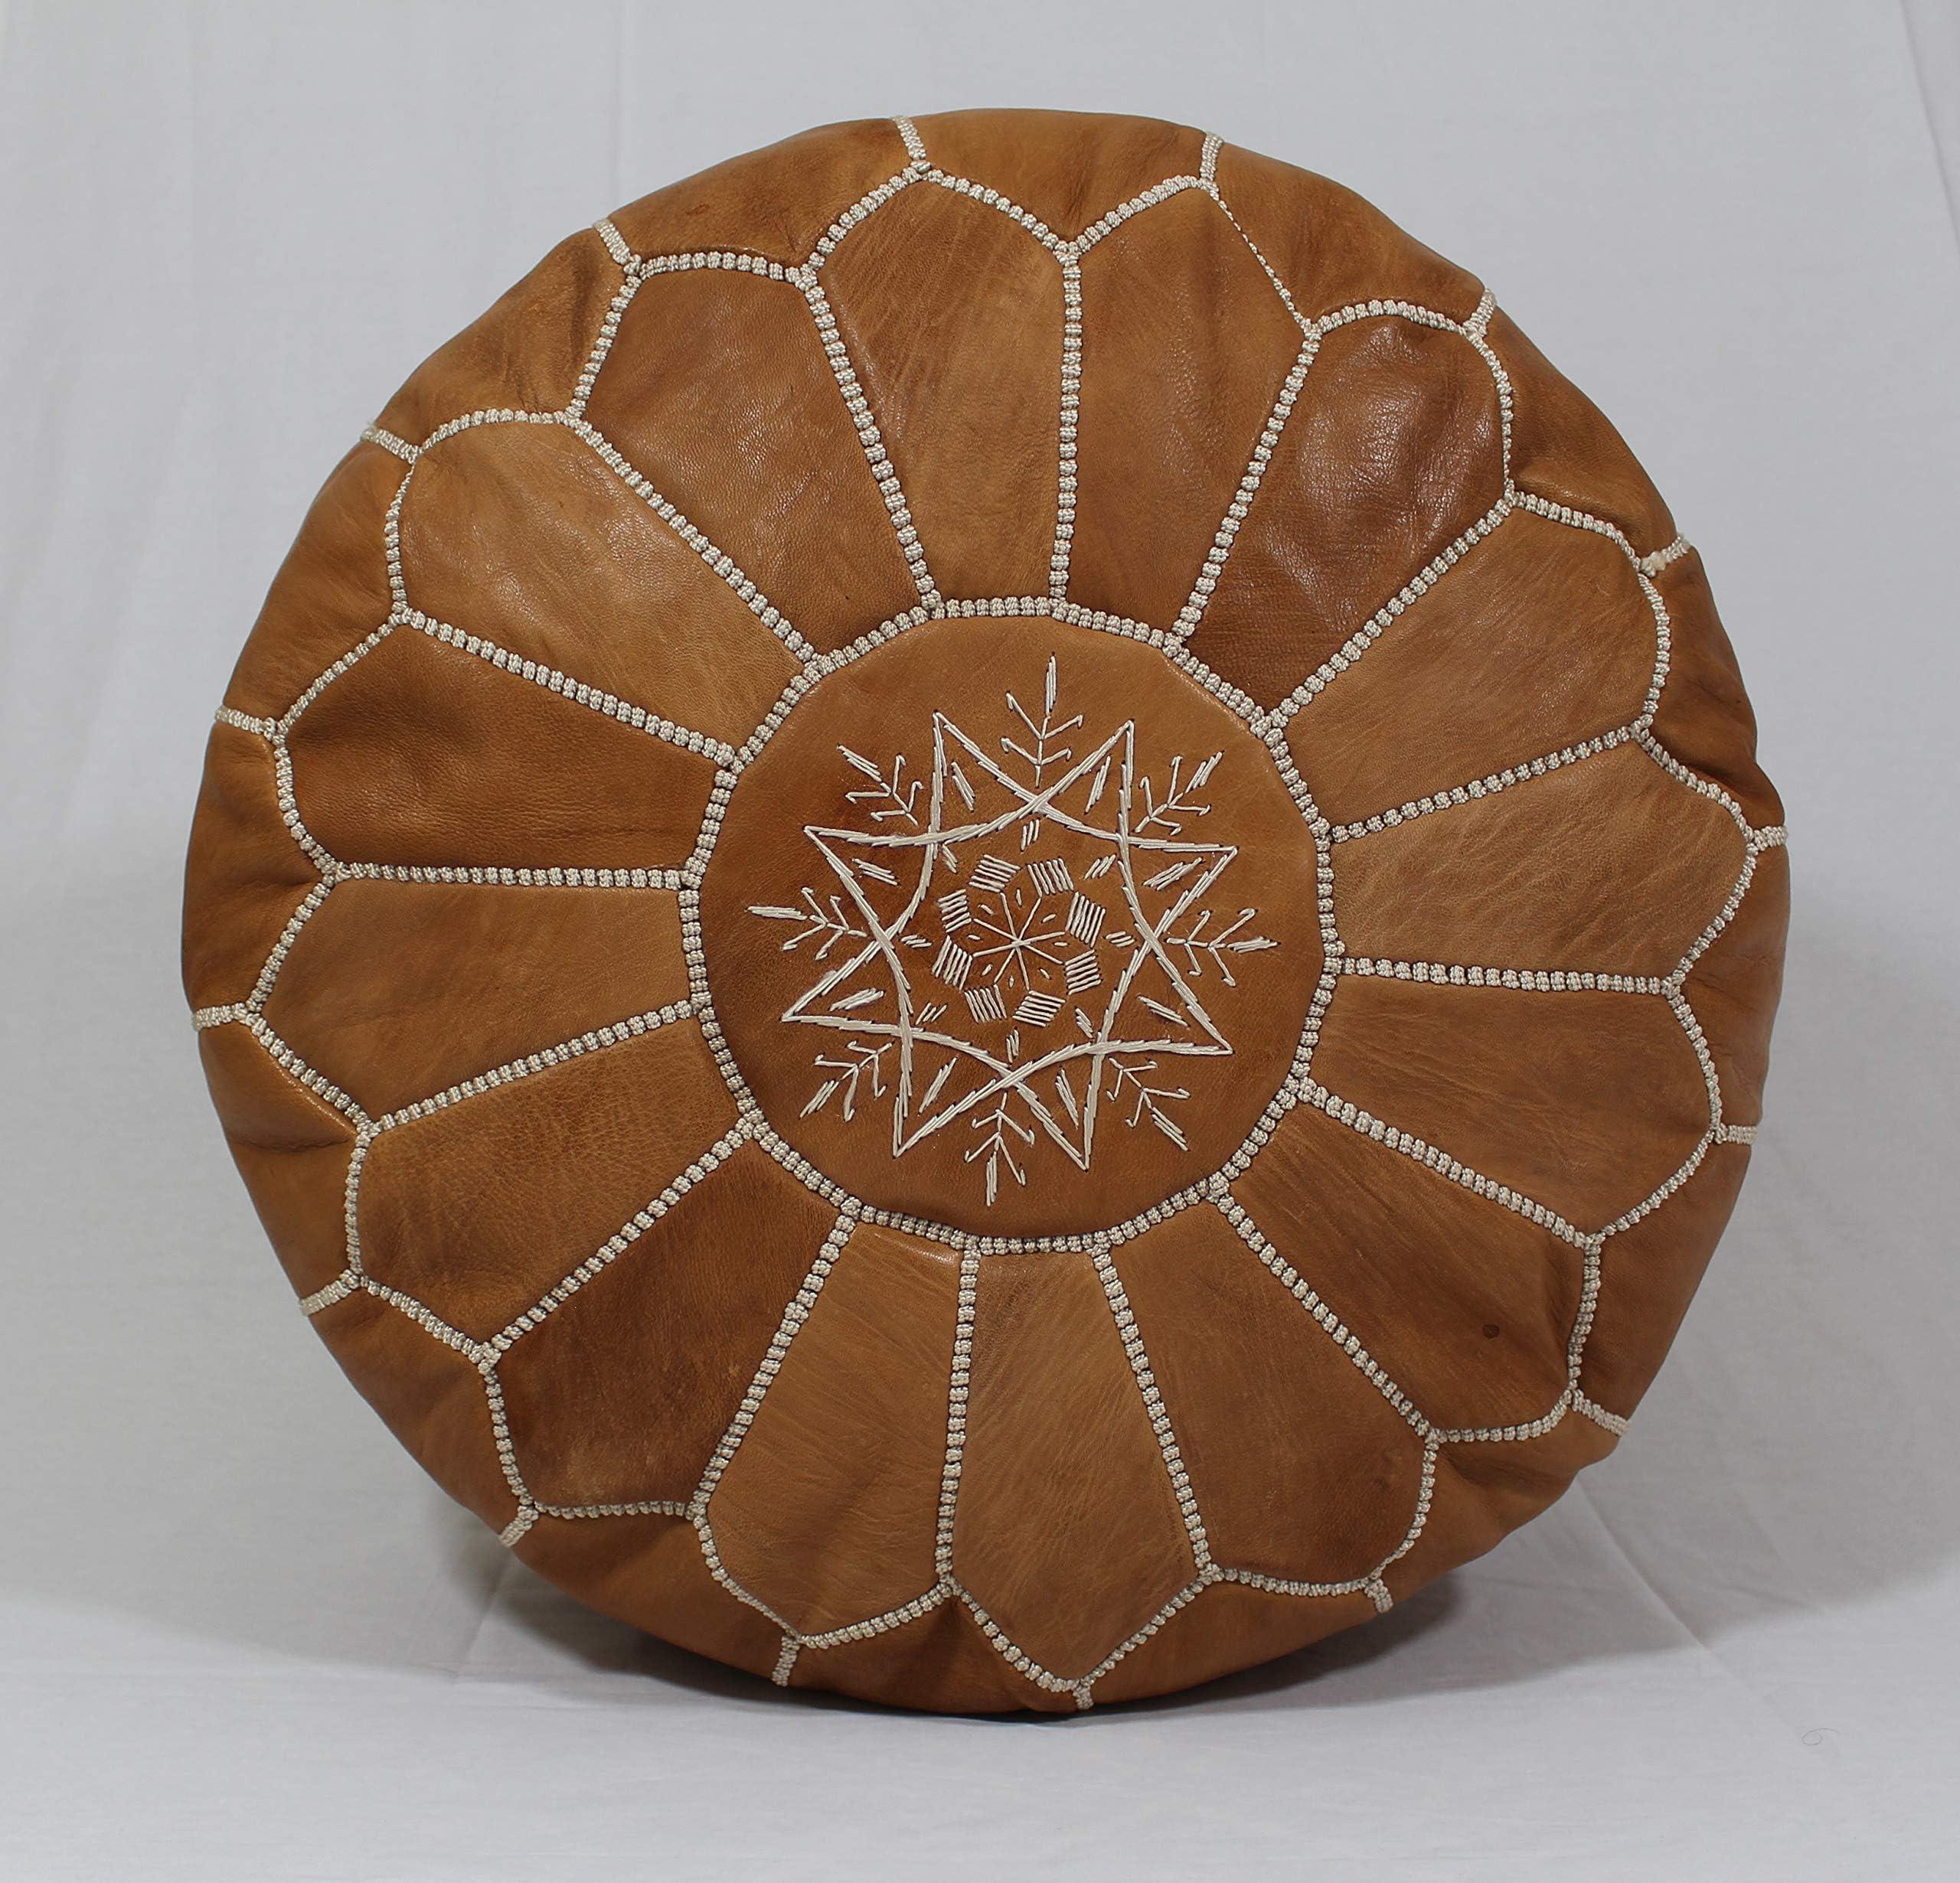 Genuine Leather Ottoman pouffe Moroccan pouf Handmade Pouf leather Unstuffed Light Tan Color Poufs Footstool